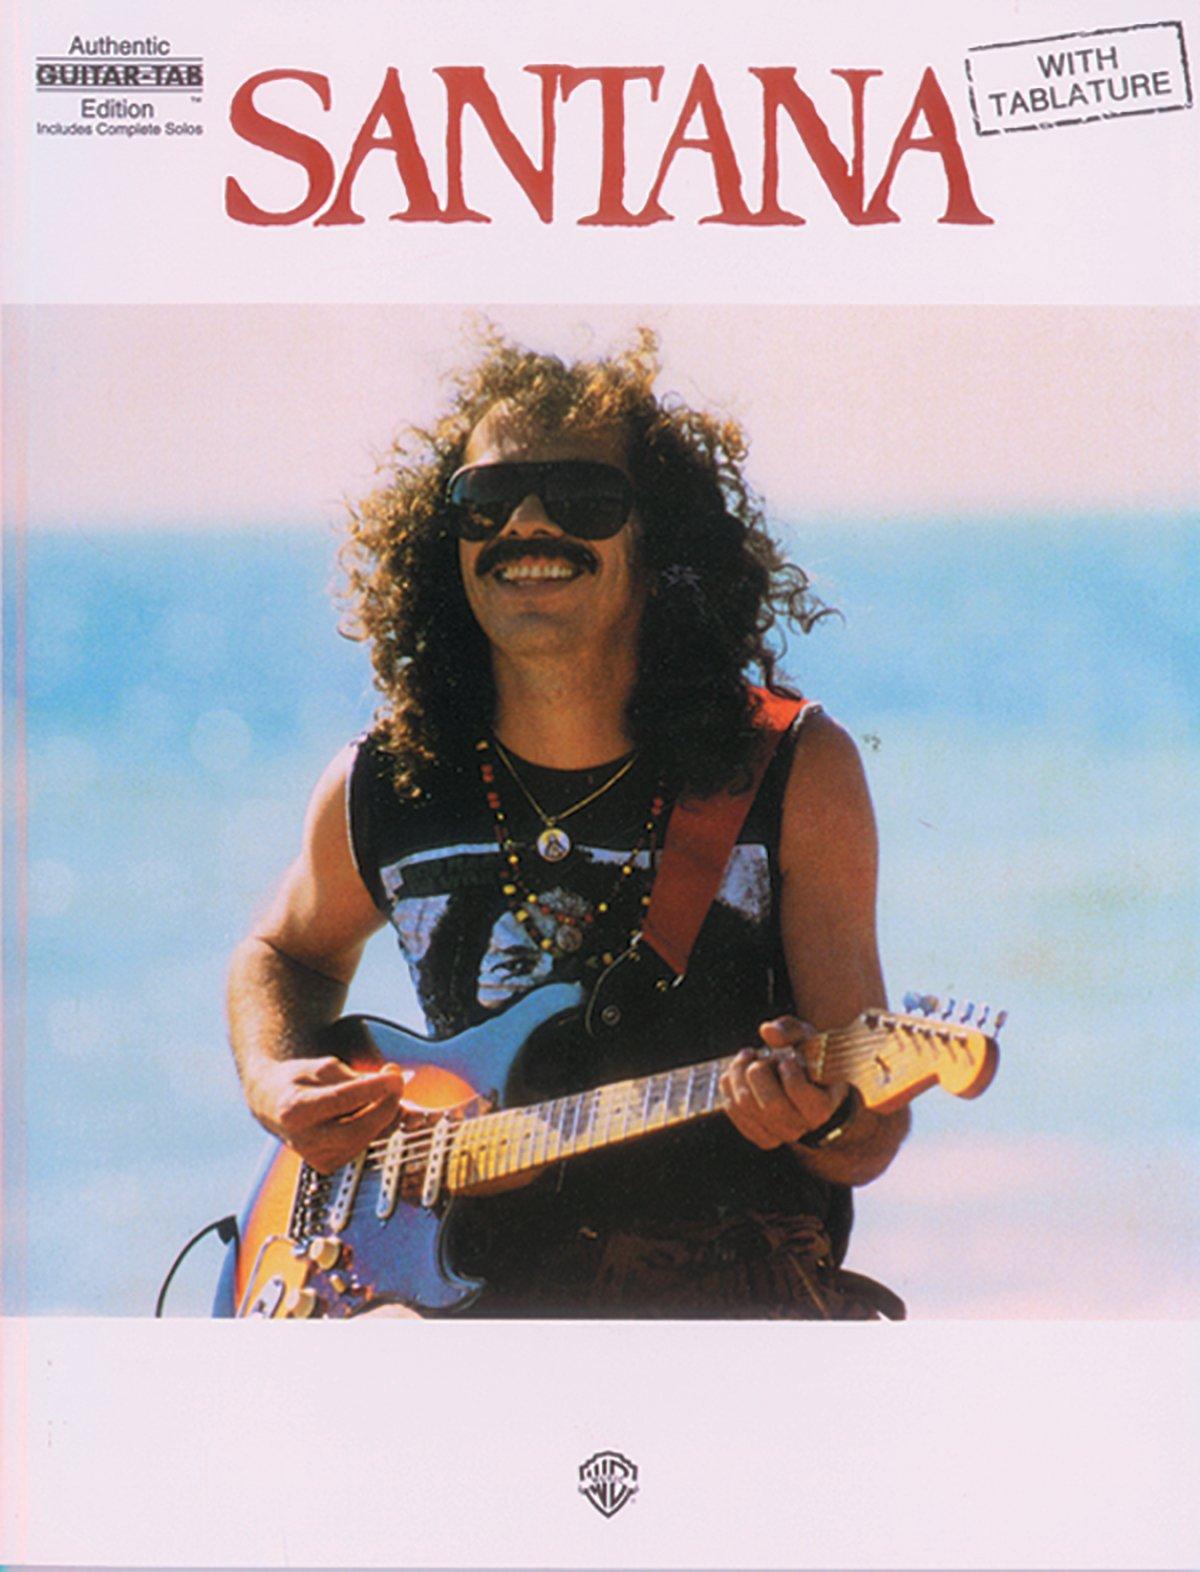 Santana: Santana Guitare (Authentic Guitar-Tab): Amazon.es ...